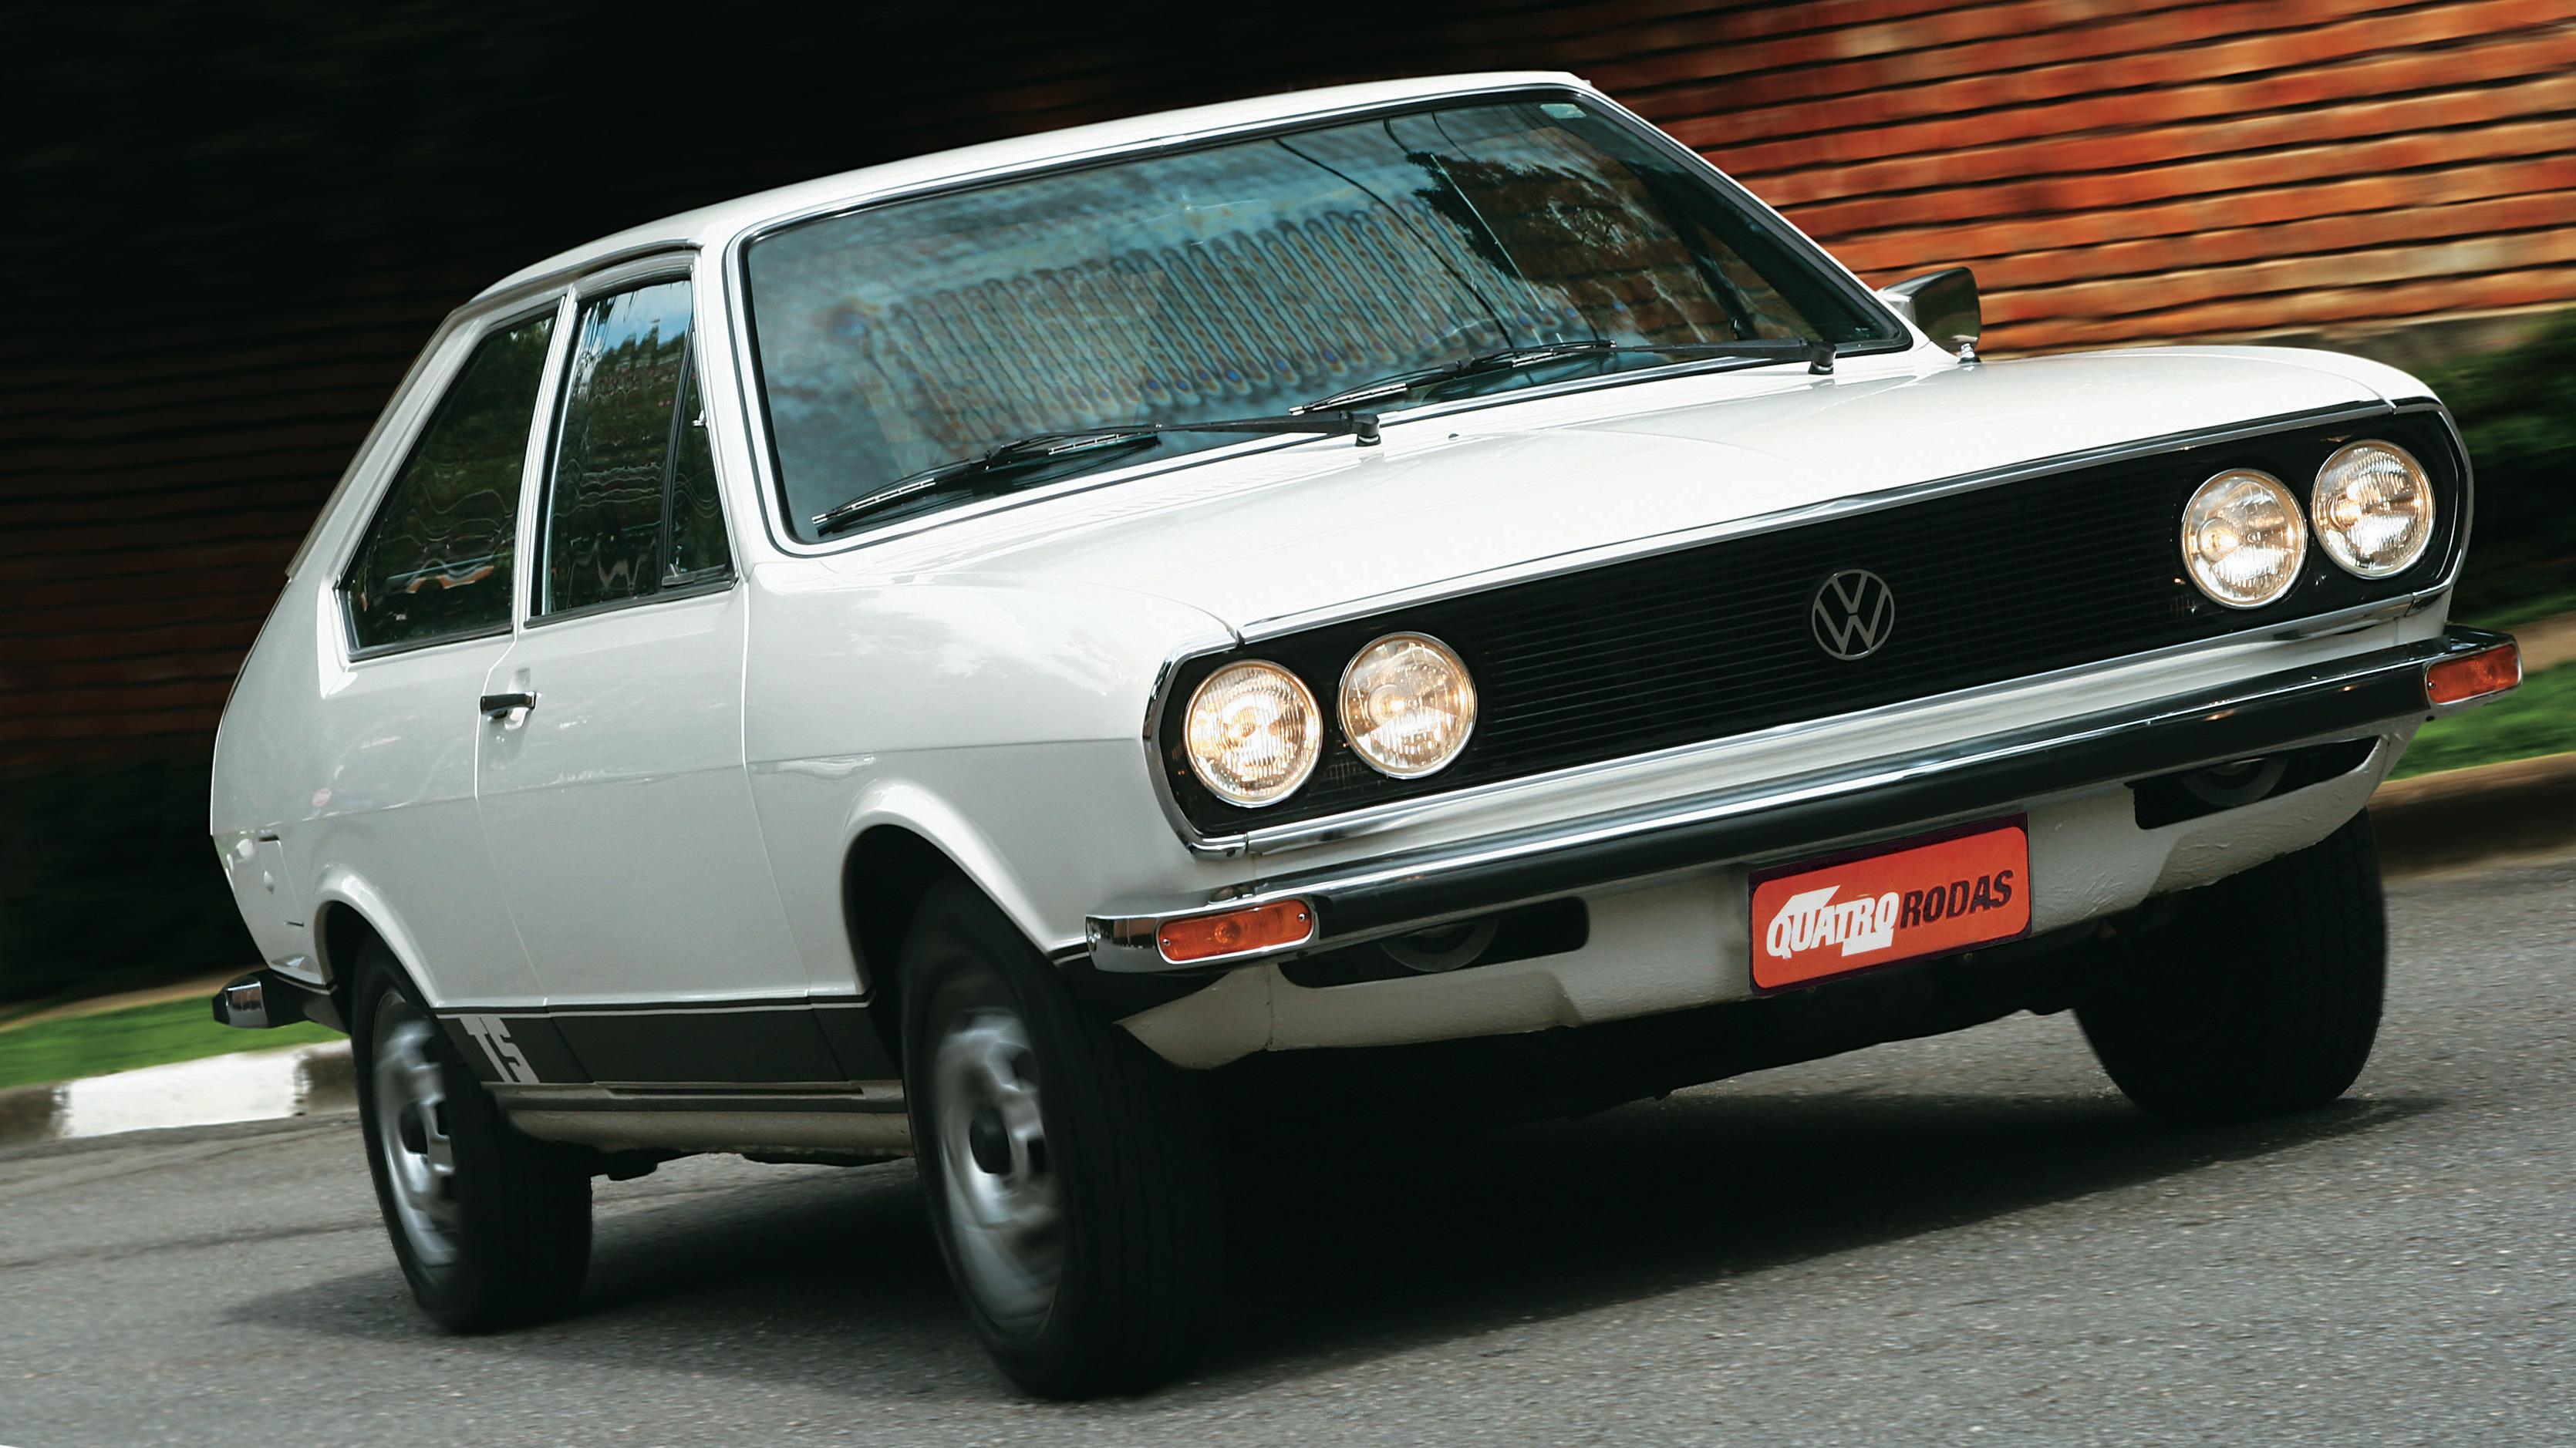 Passat TS, modelo 1978 da Volkswagen, testado pela revista Quatro Rodas.